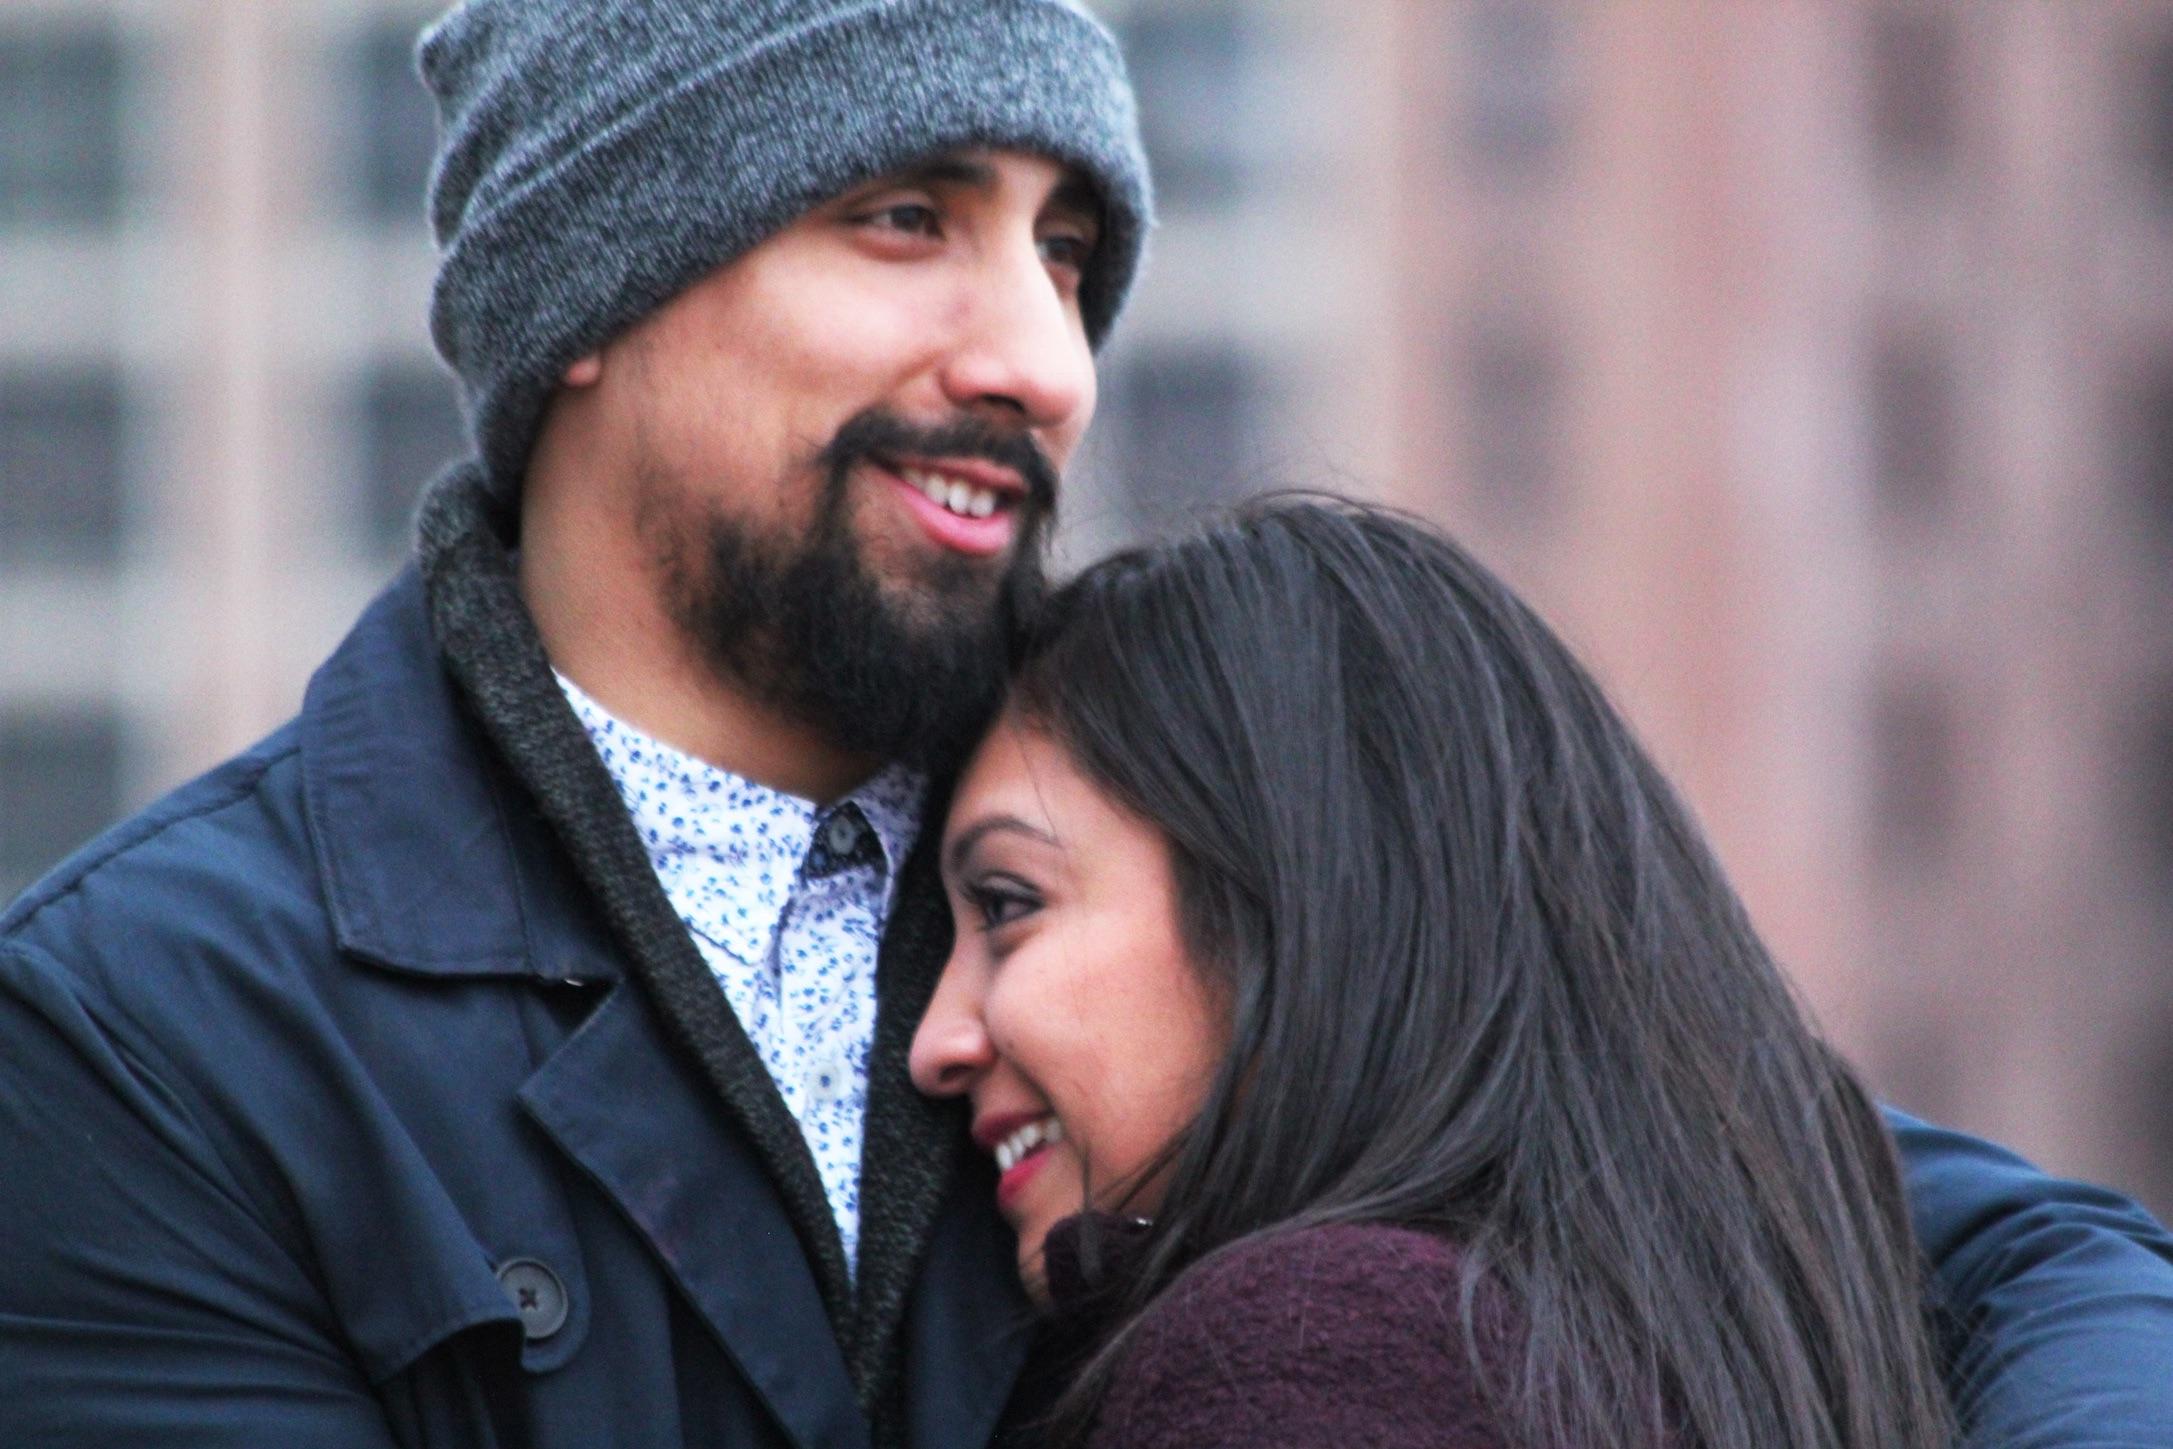 Image 6 of Kelly and Alvaro